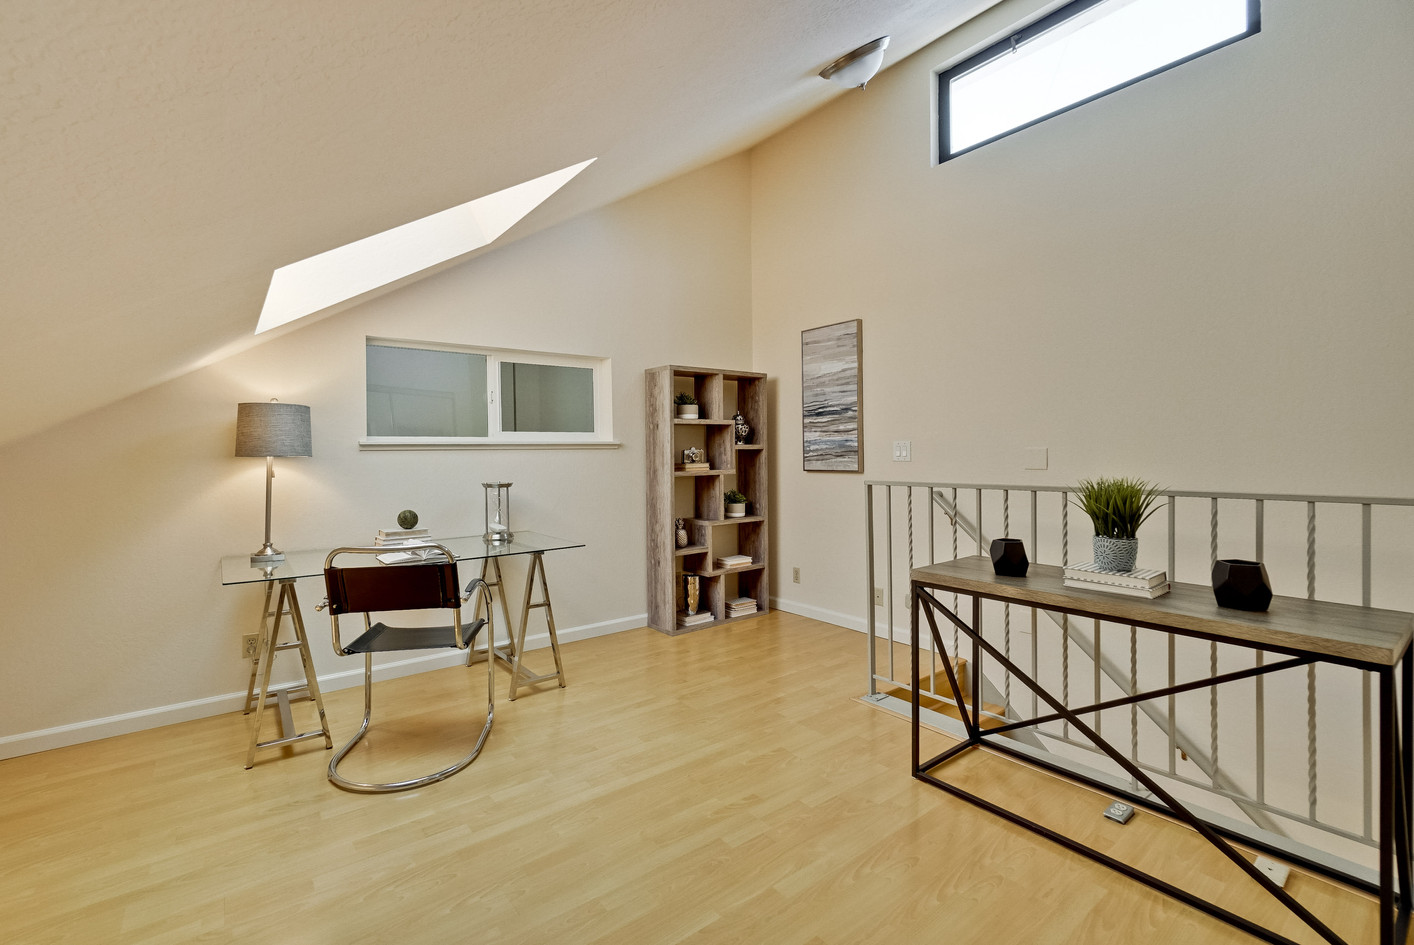 Loft above Master Bedroom